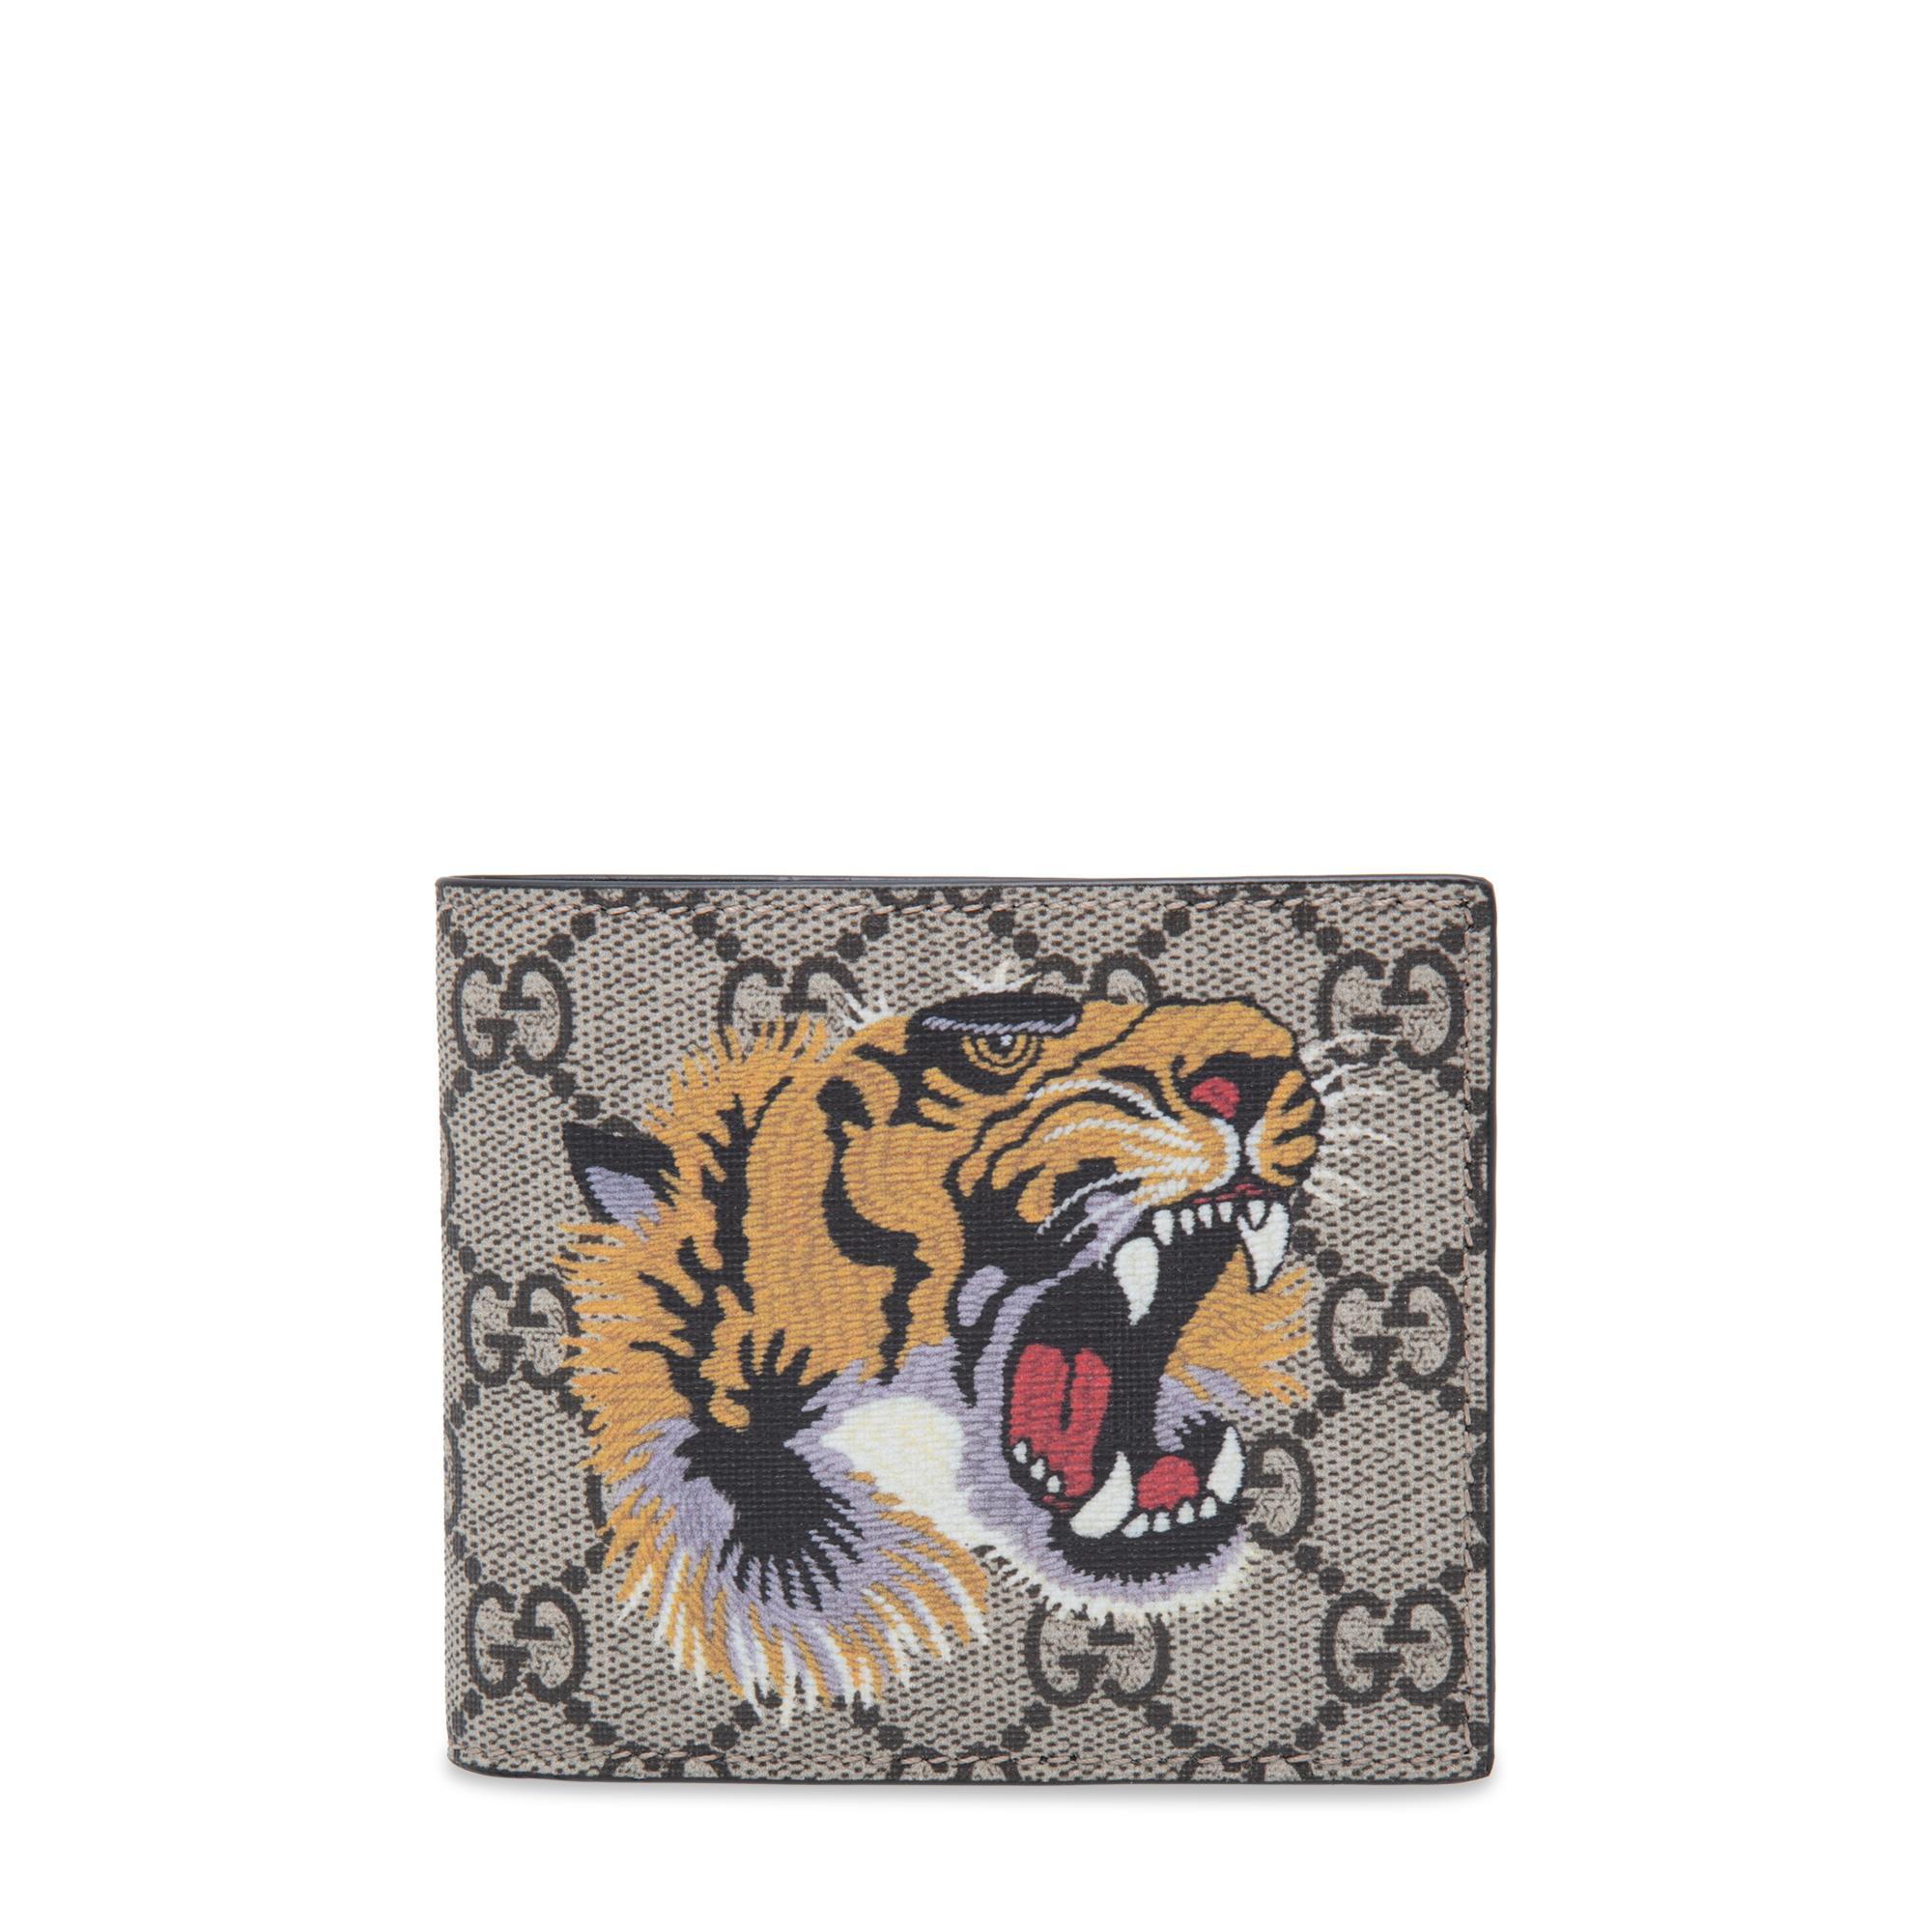 Tiger GG Supreme wallet